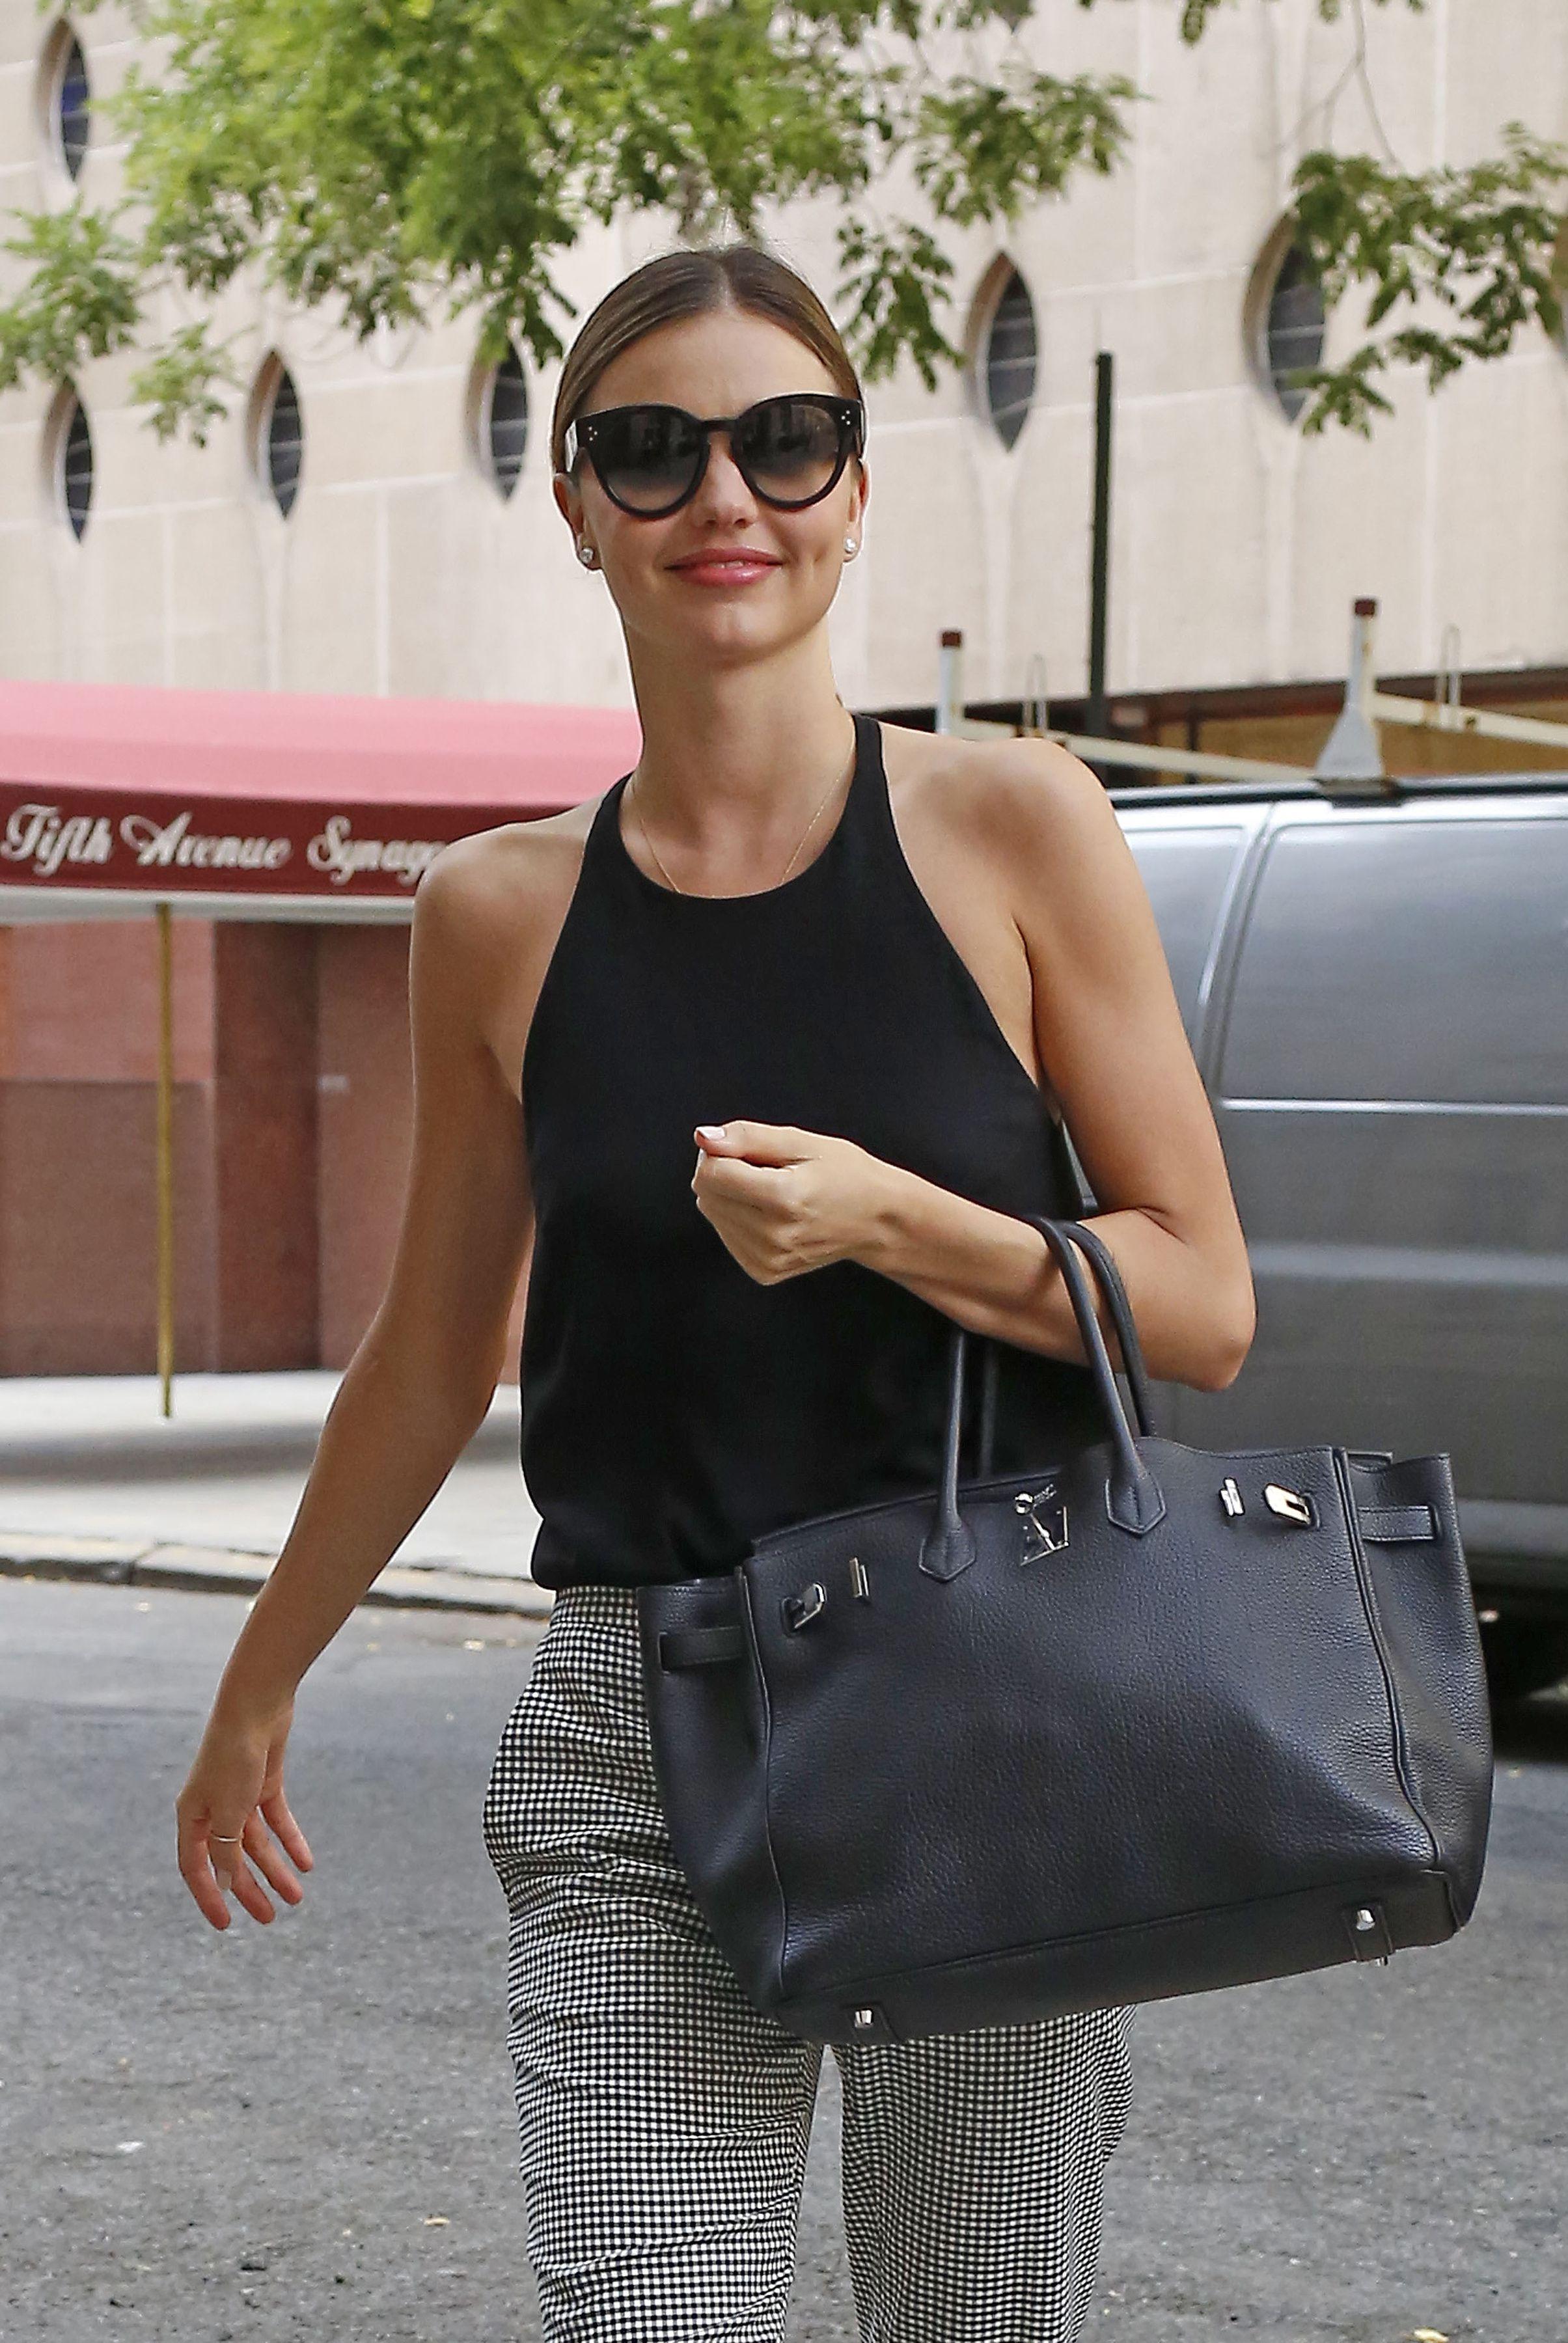 Miranda Kerr - Page 1165 - Fashion Models - Bellazon Miranda Kerr Bellazon